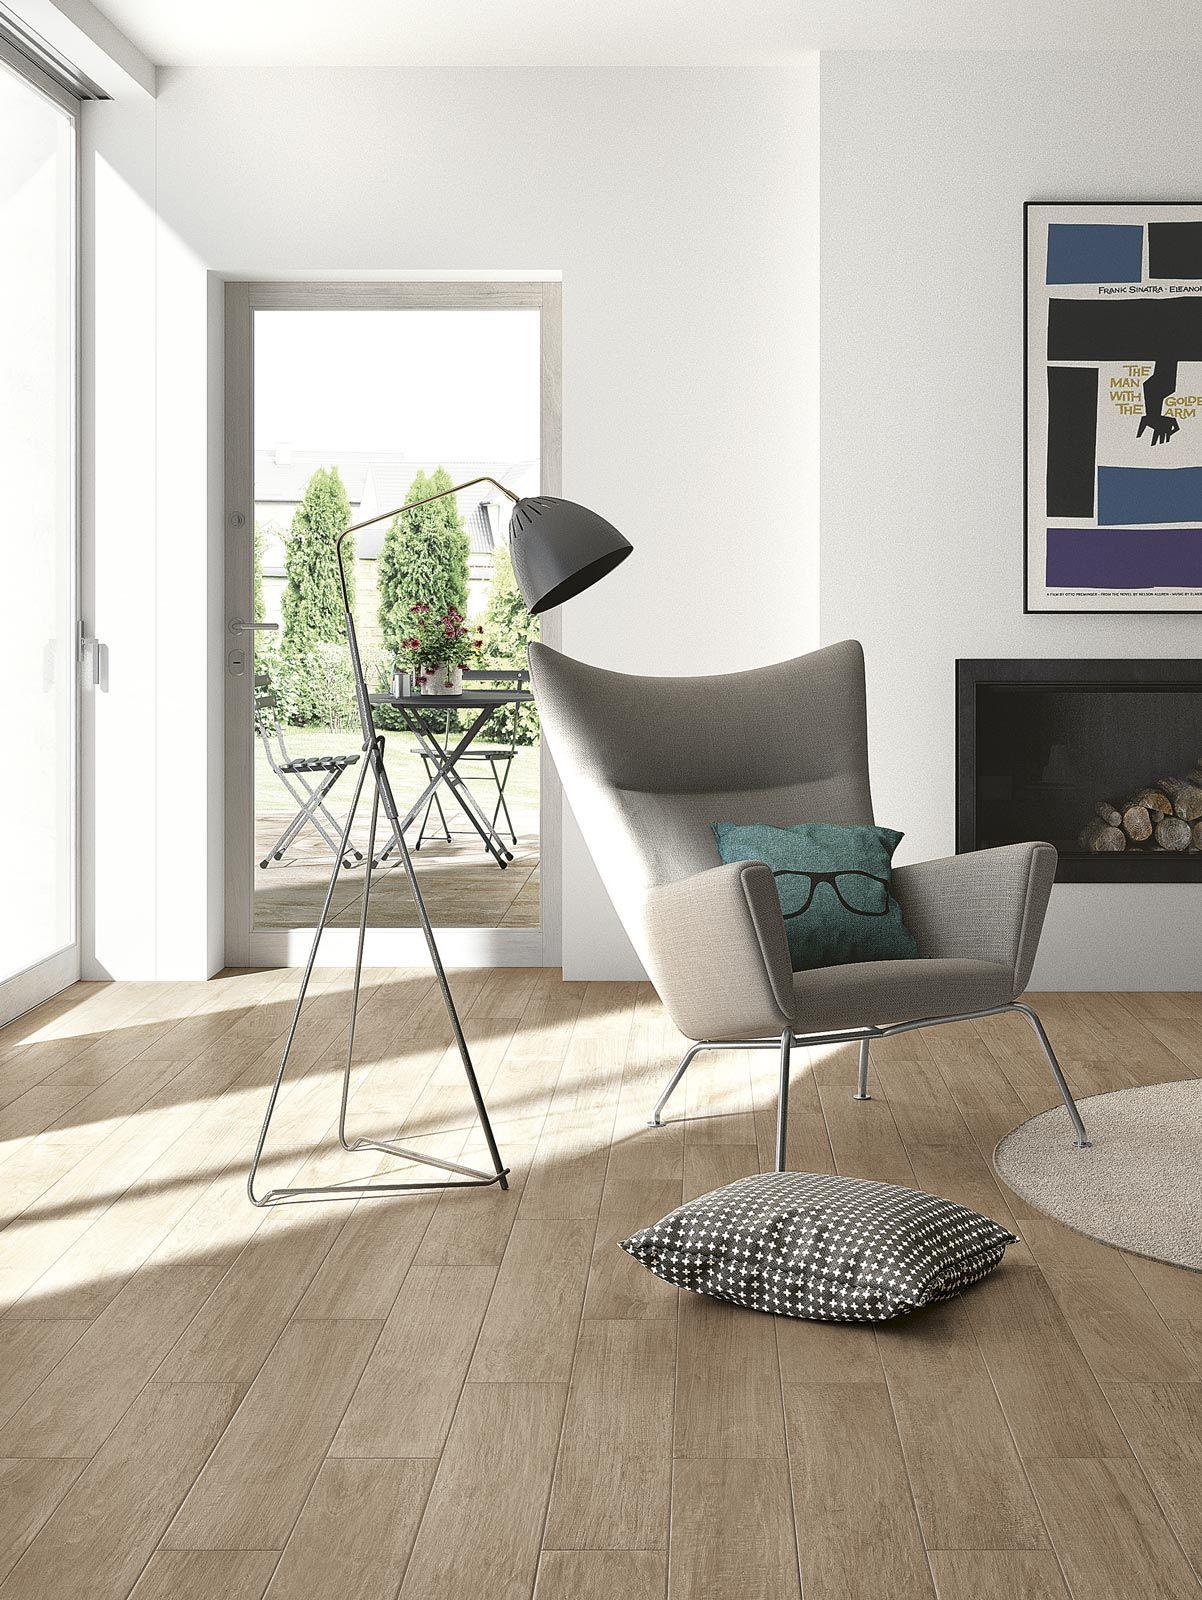 Woodcomfort Wood Look Floor And Wall Tiles Interior Porcelain